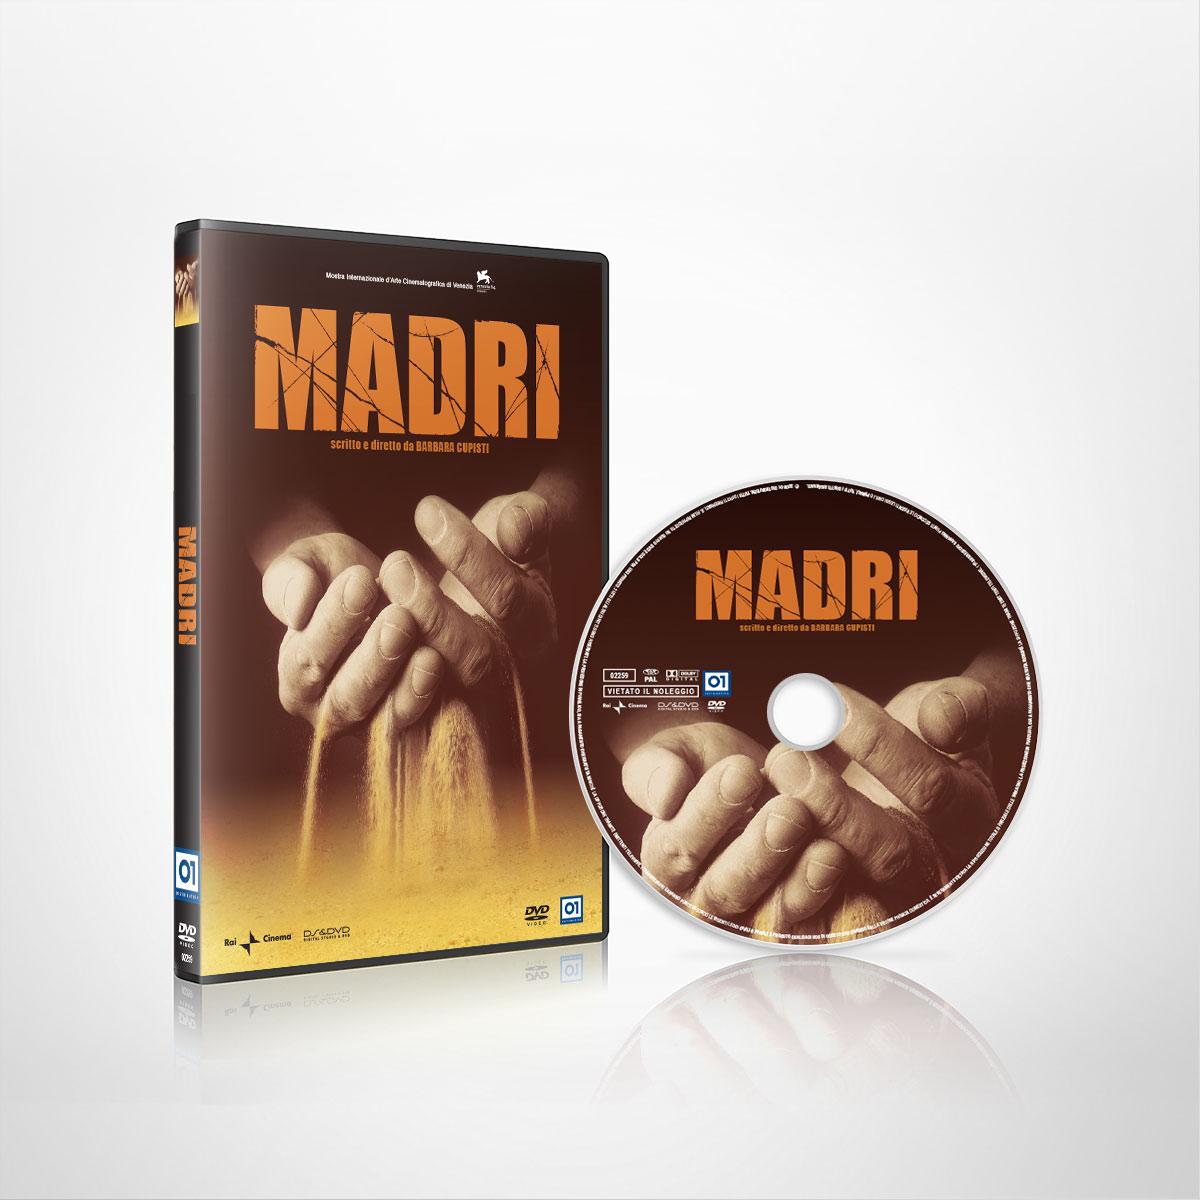 Packshot con fascetta e label del documentario Madri